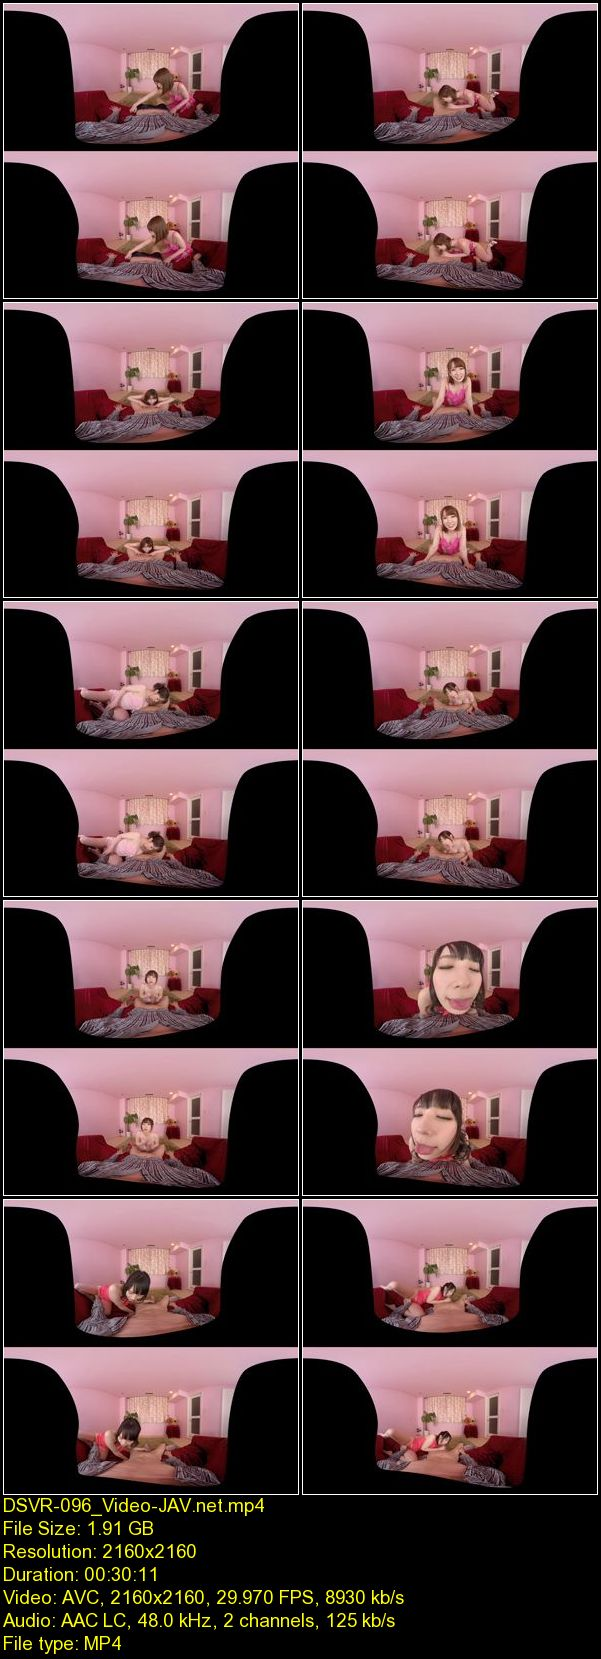 DSVR-096_Video-JAV.net.mp4.scrlist.jpg